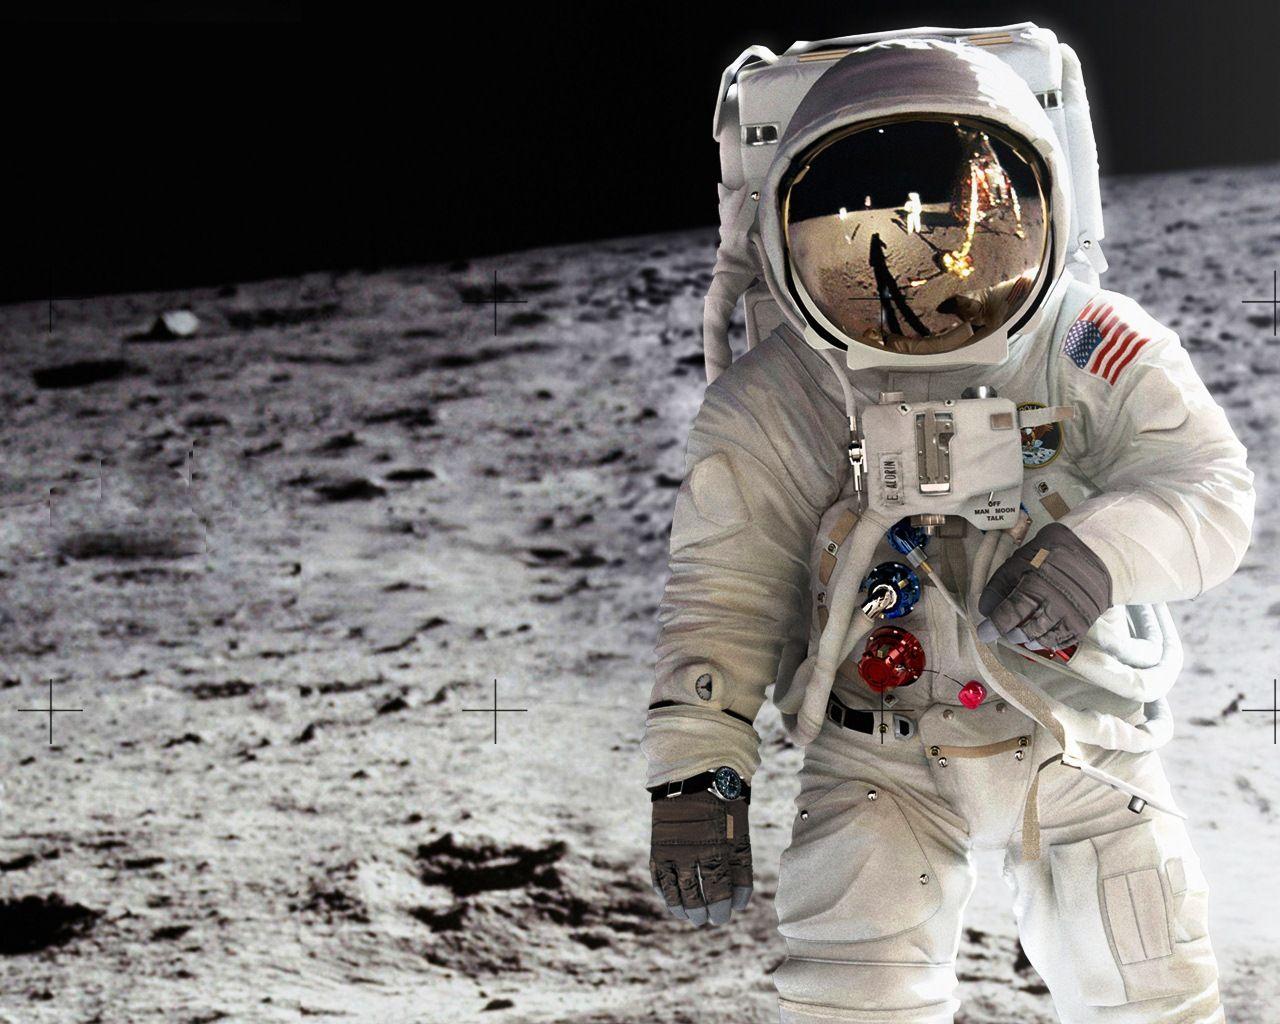 astronaut photo shoot backgrounds astronaut america hd